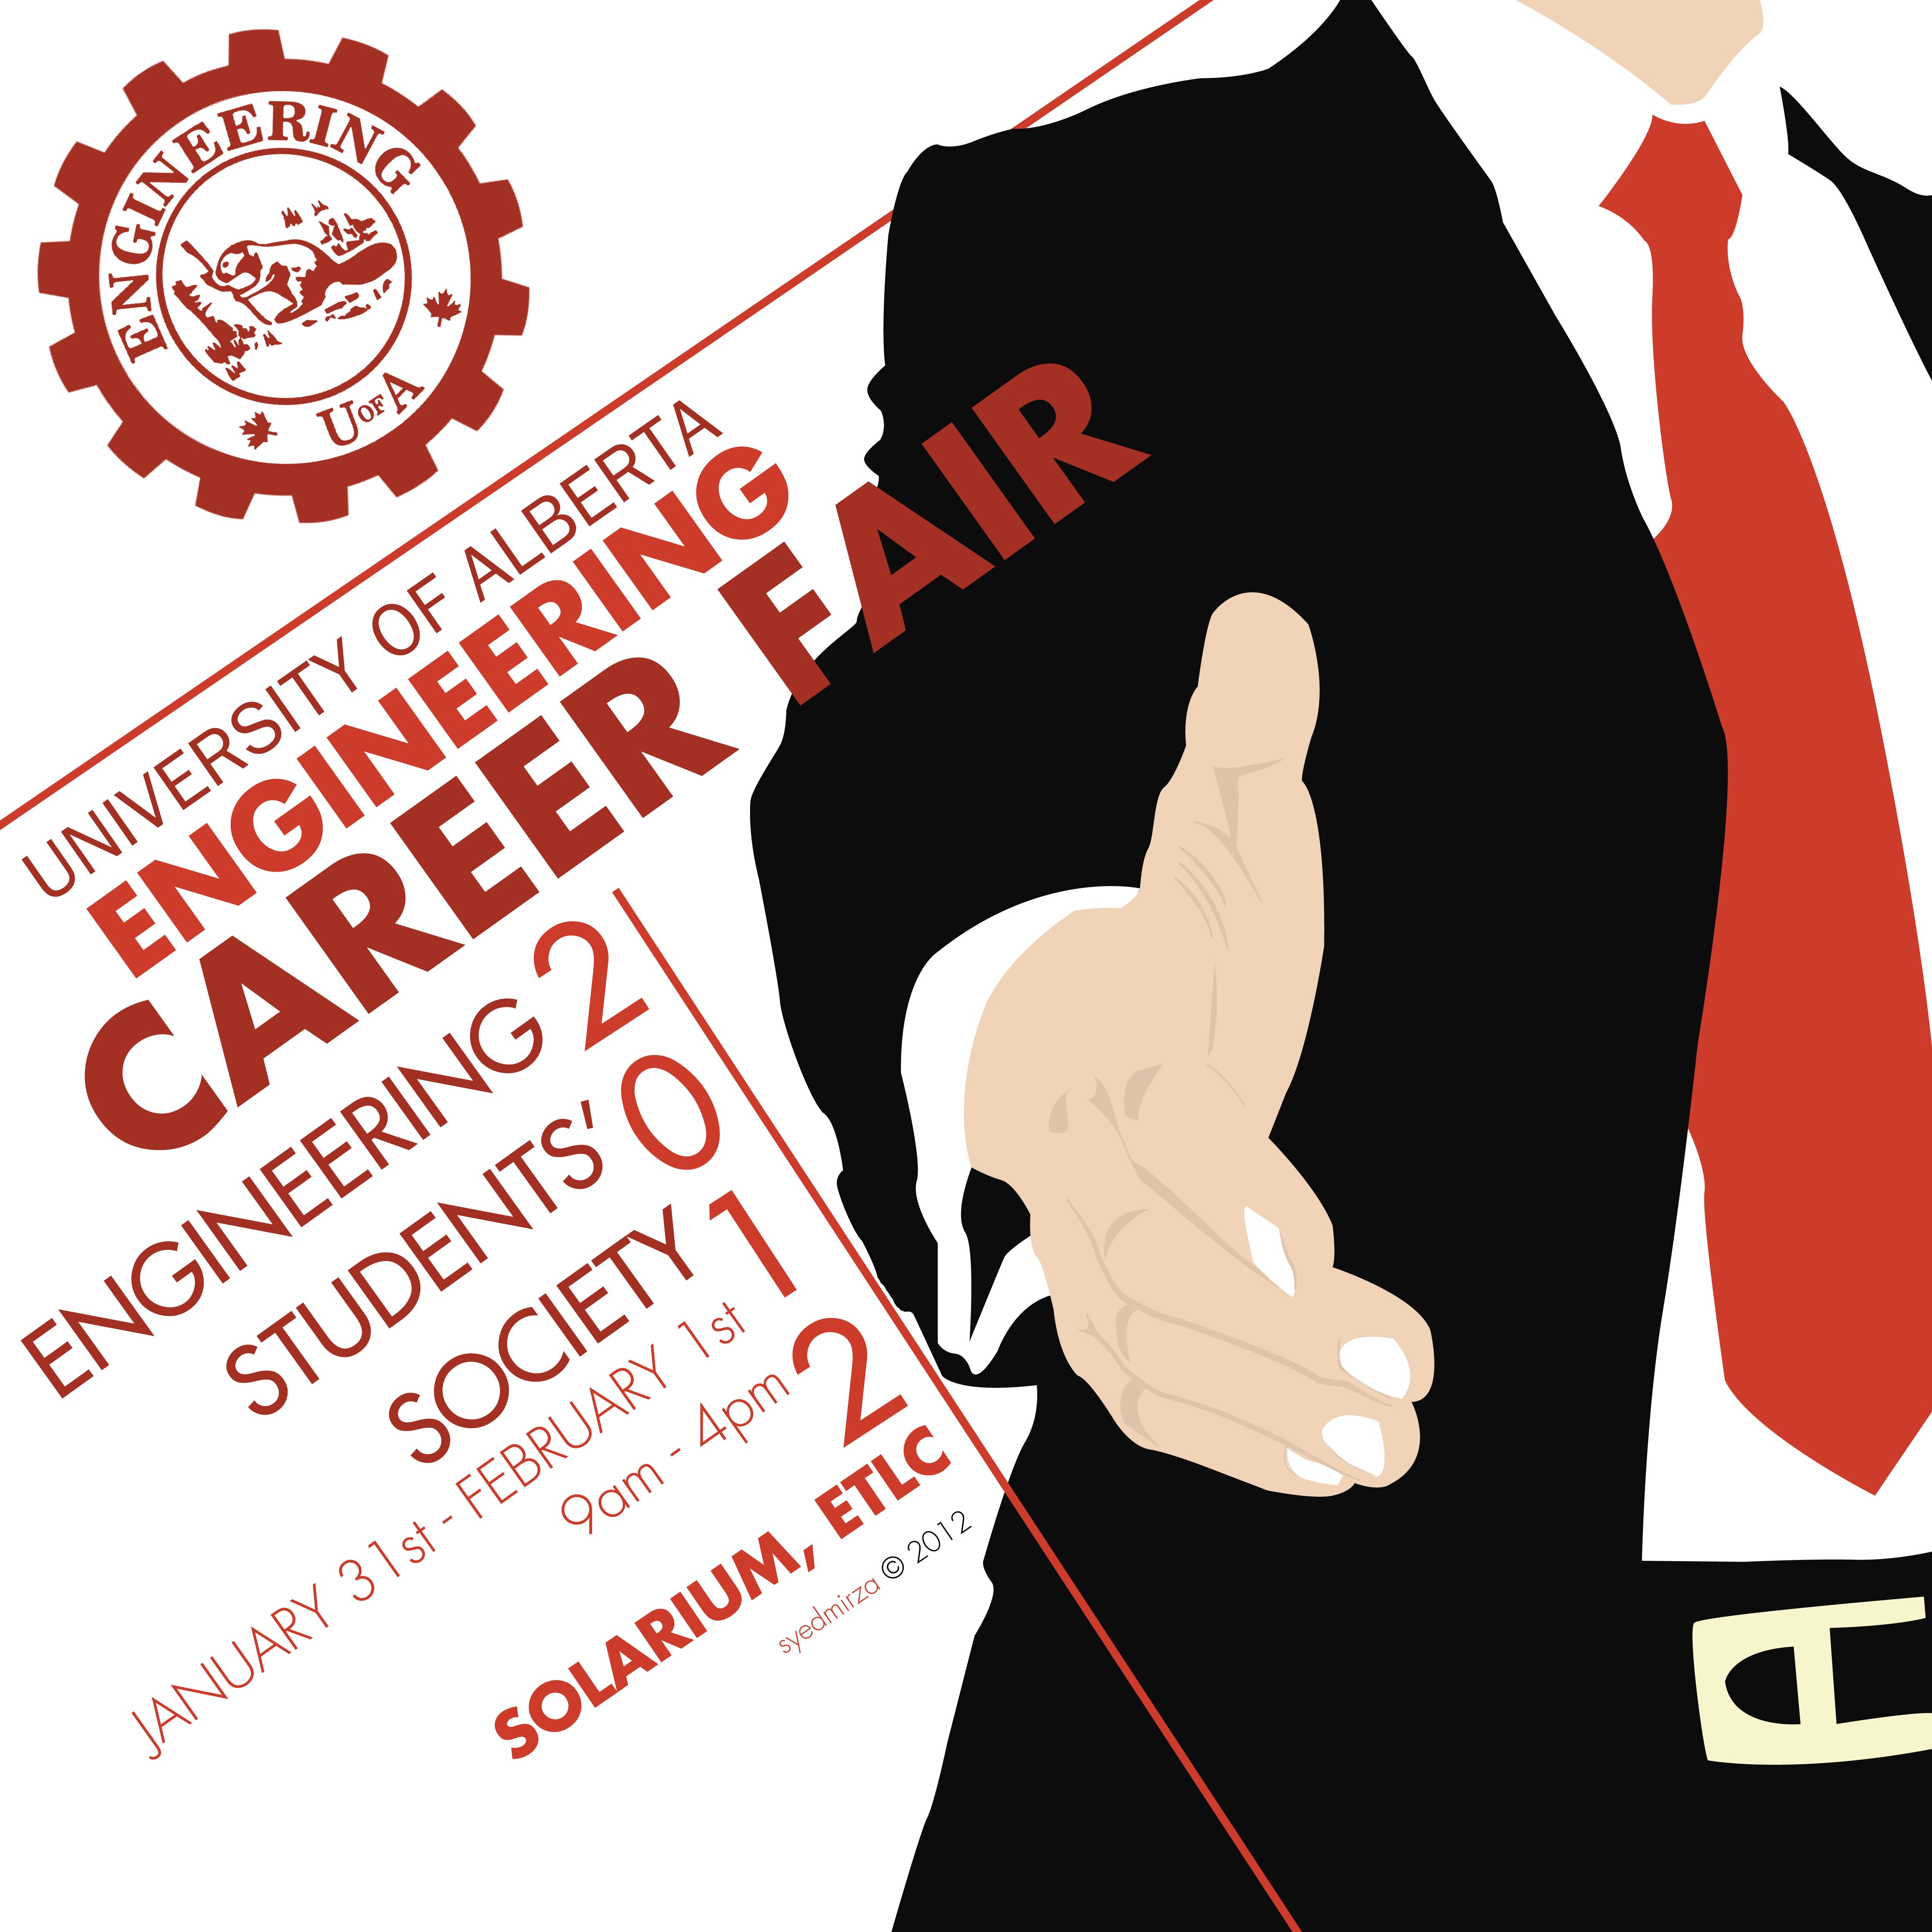 Blue apron job fair - Career Fair Poster By Ikaash On Deviantart